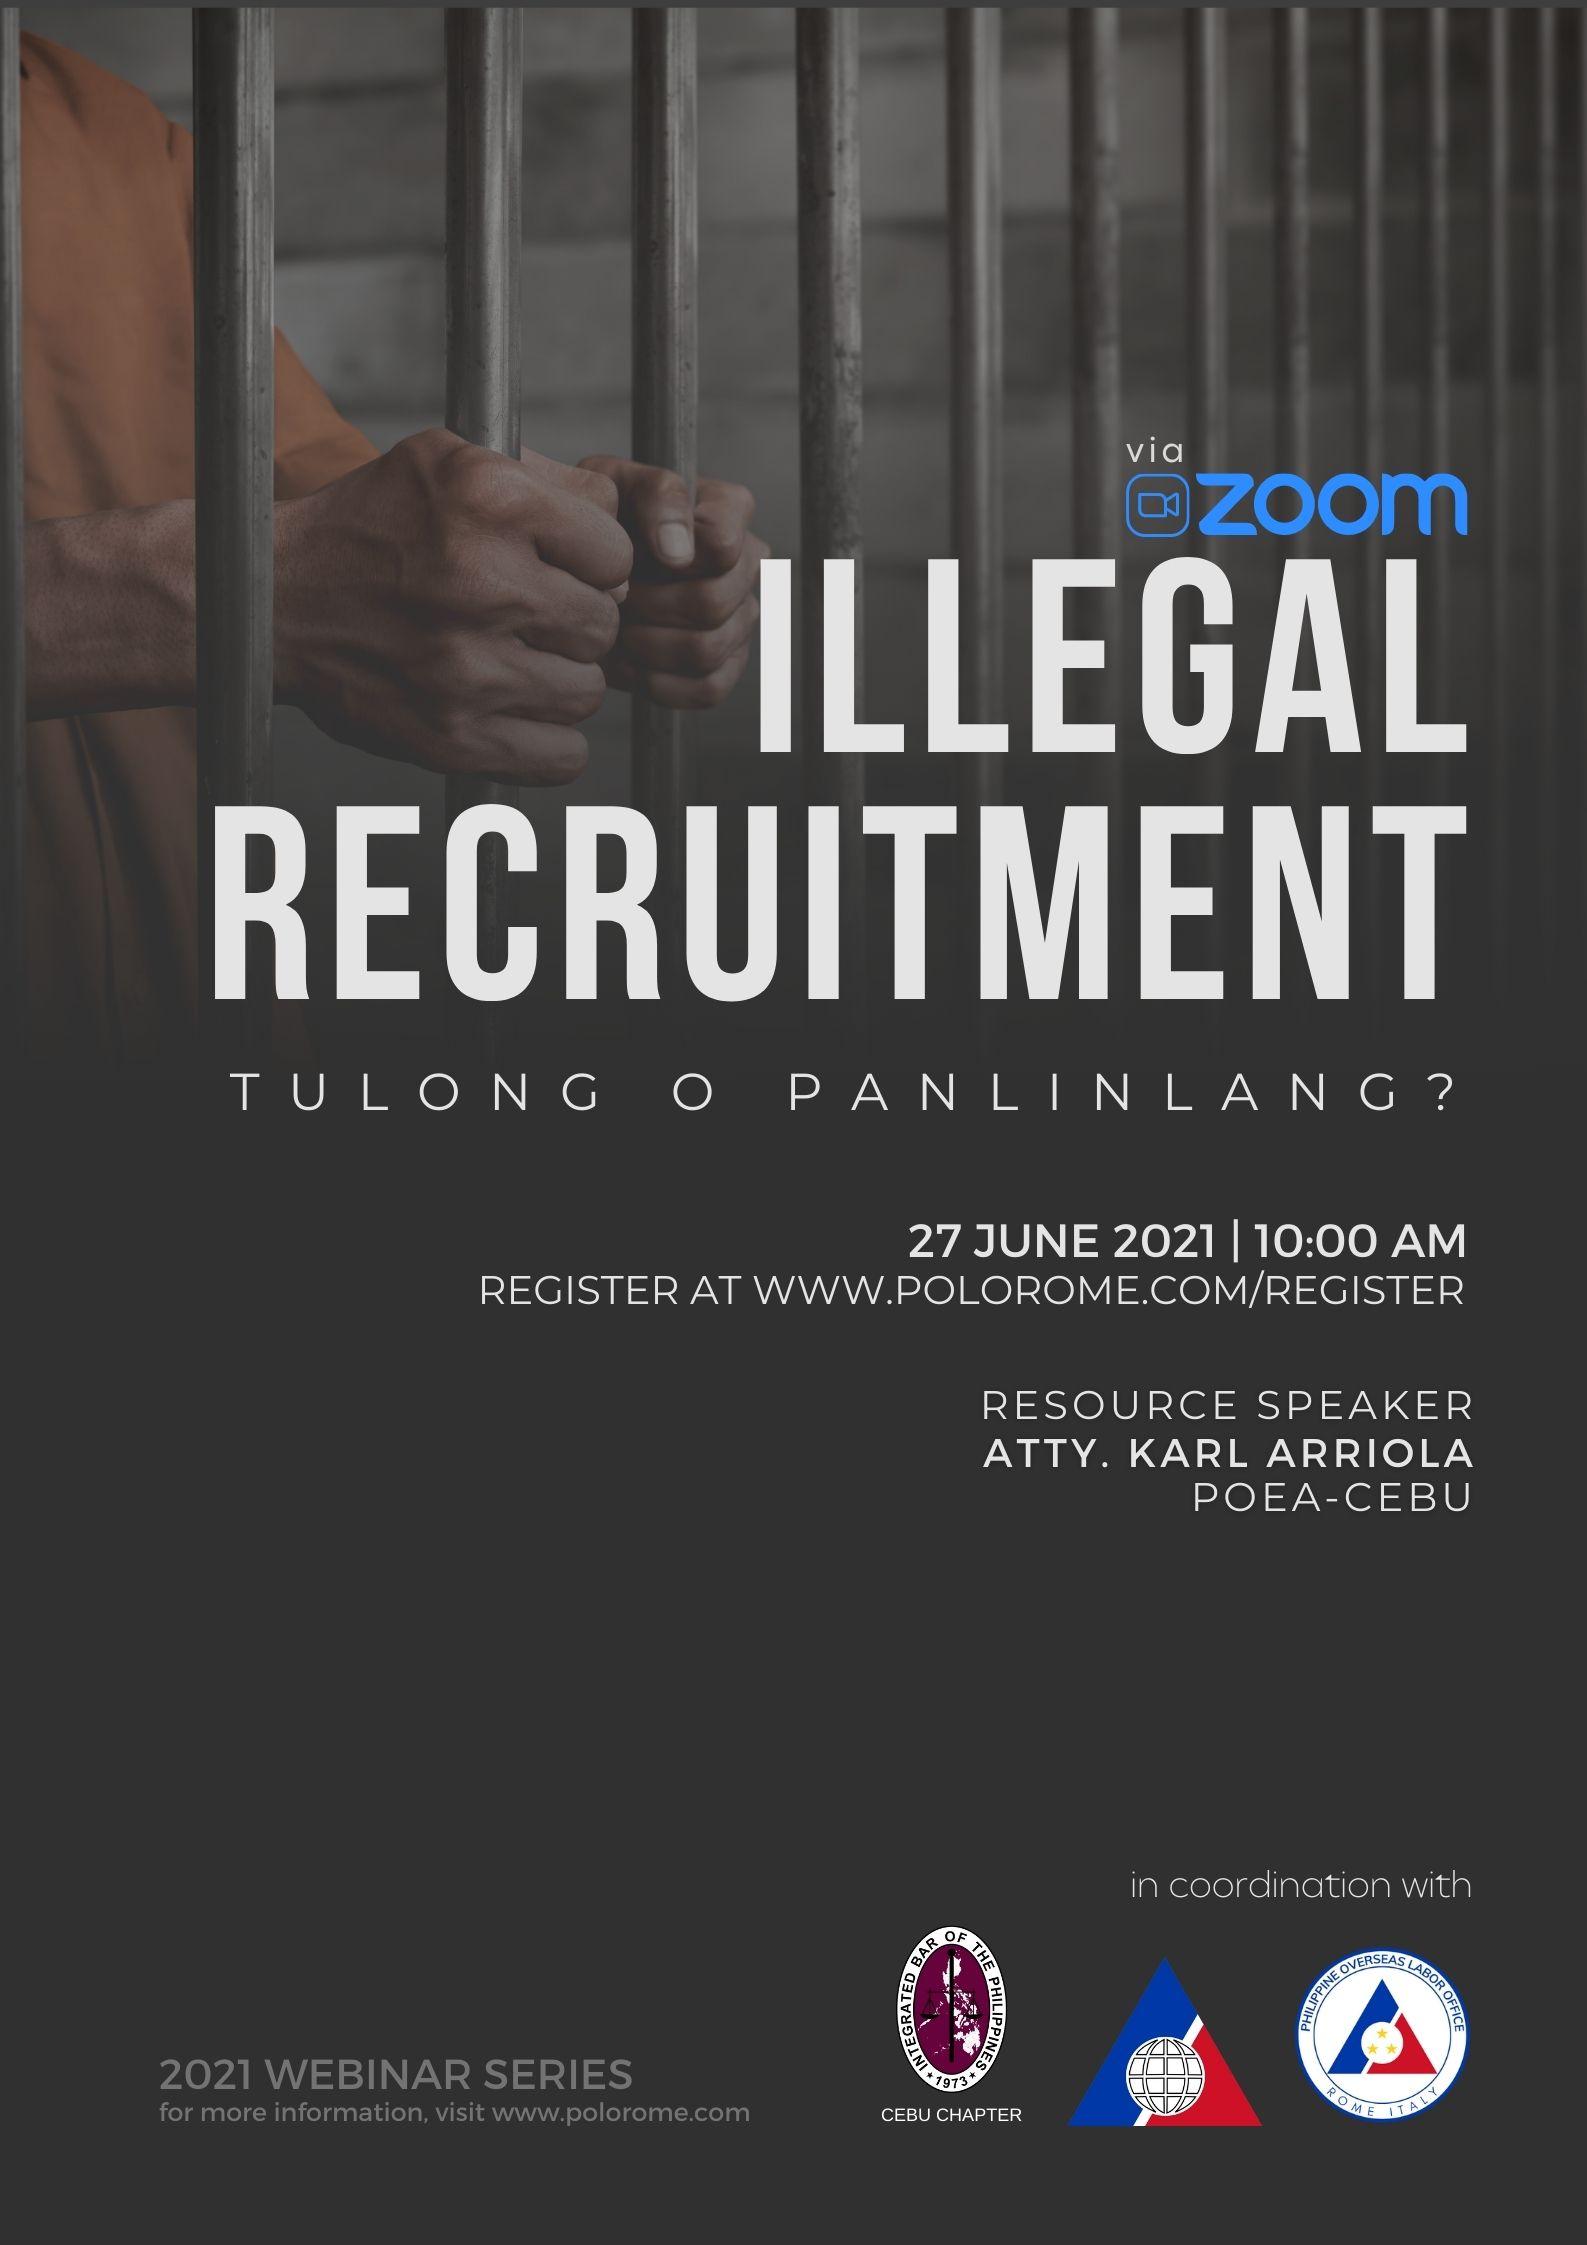 Webinar Series – Illegal Recruitment: Tulong o Panlinlang – with IBP Cebu Chapter